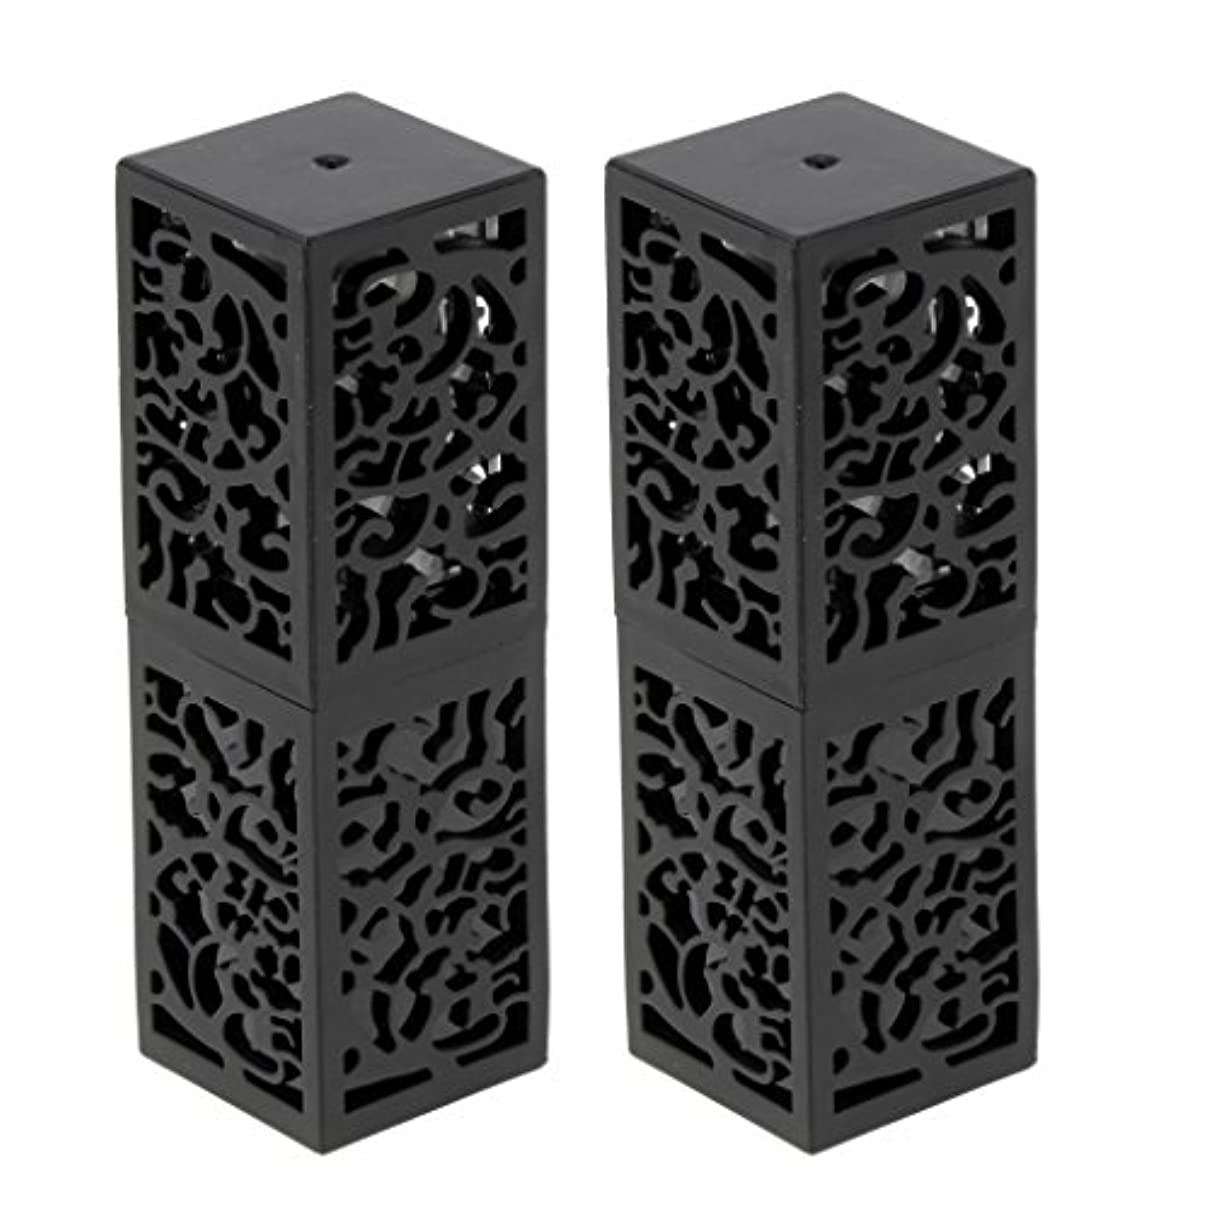 T TOOYFUL 2本入り 空チューブ リップスティックチューブ 口紅チューブ リップクリーム 容器 化粧品 全2色 - ブラック